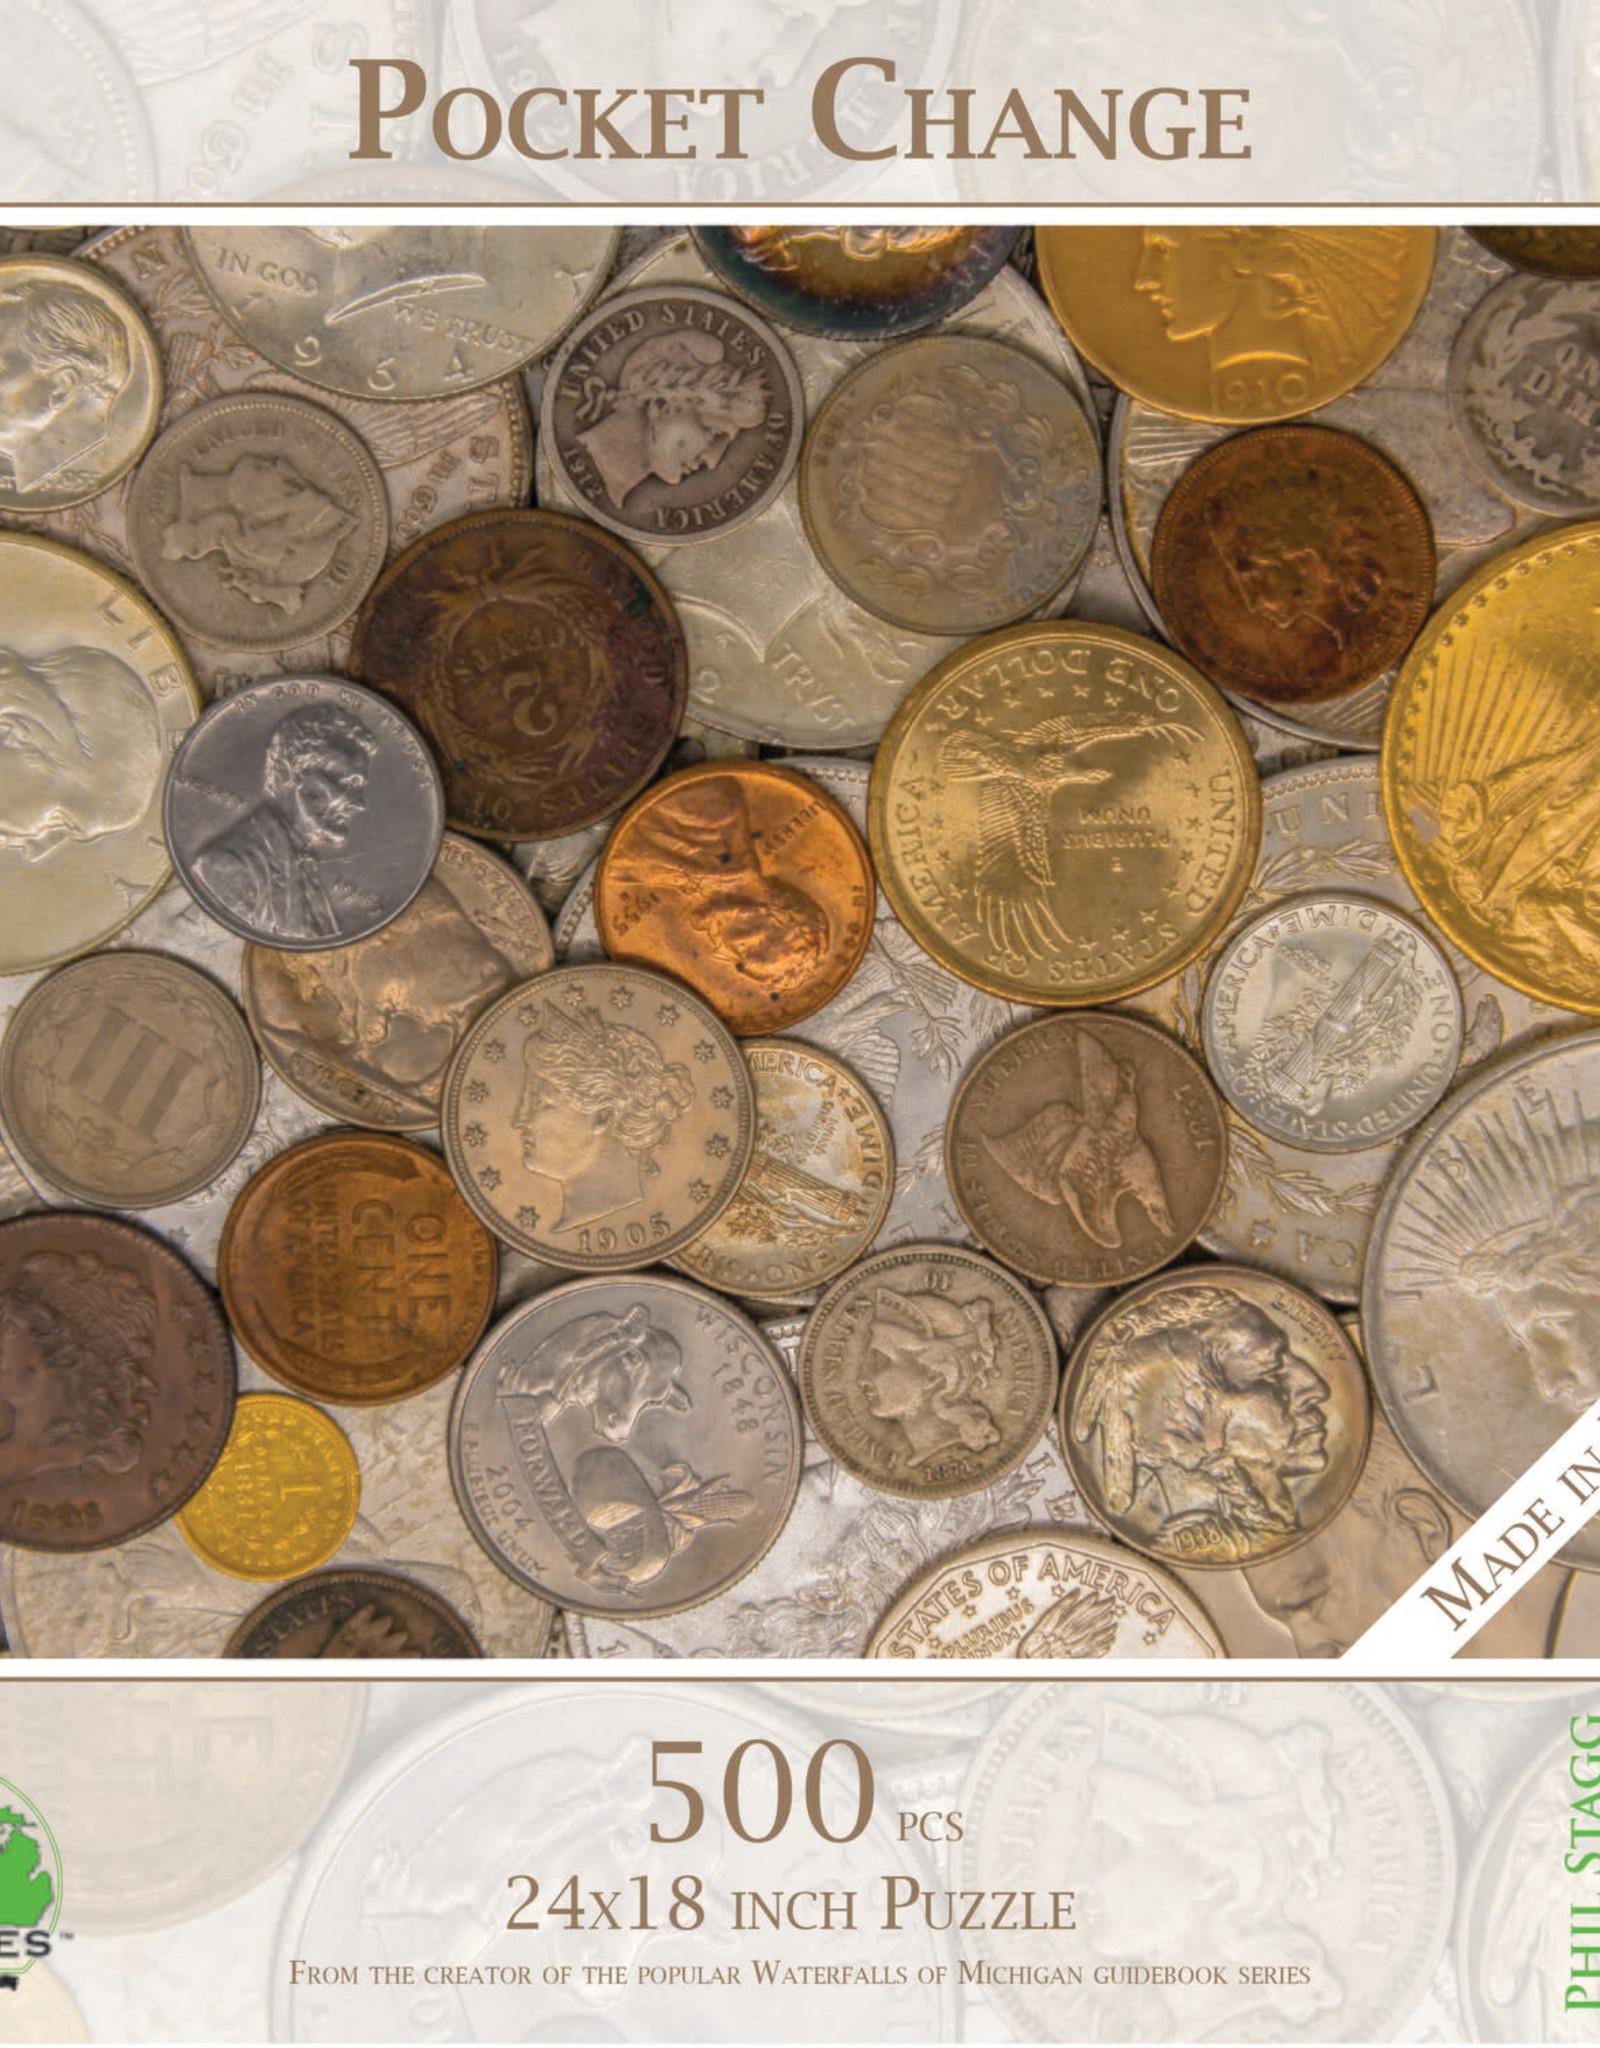 500pc Pocket Change